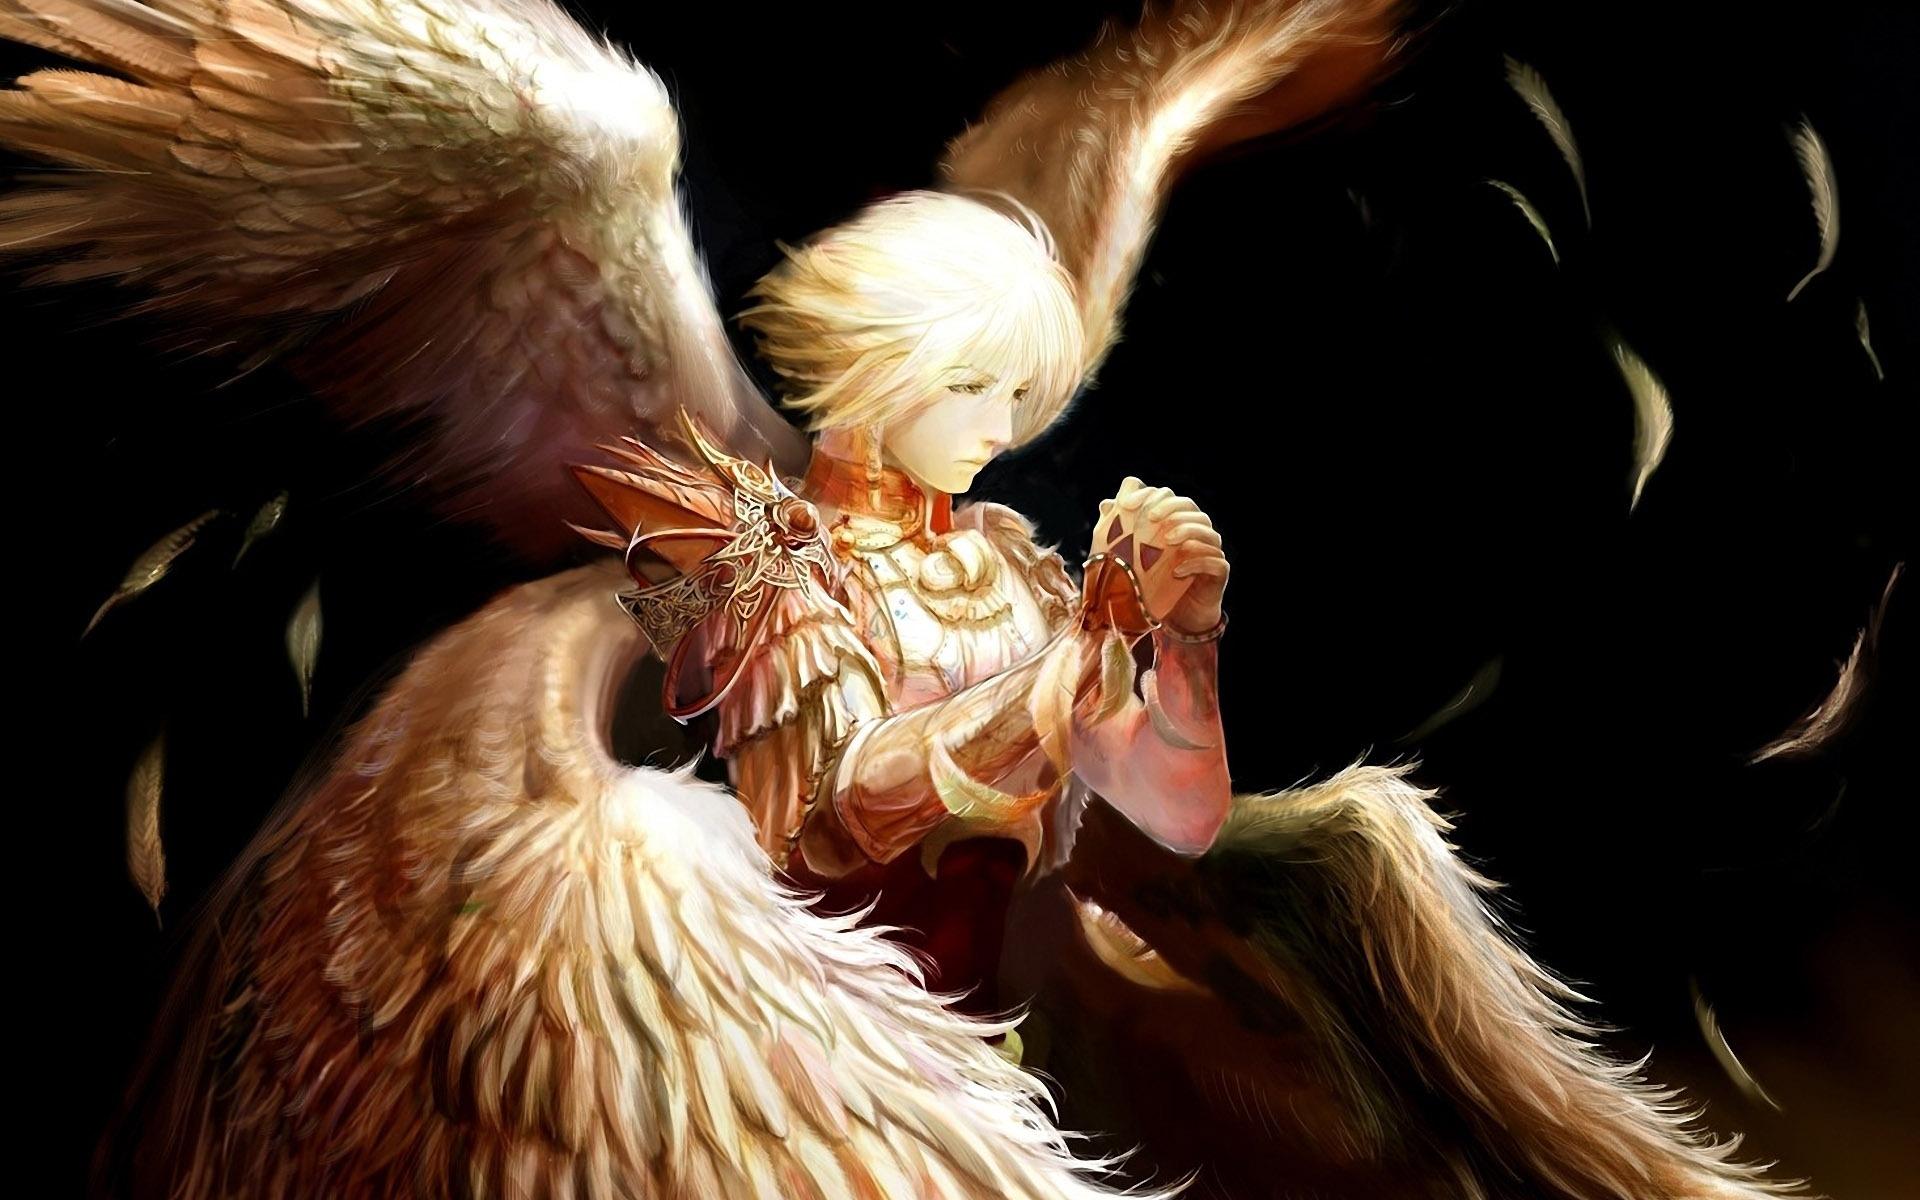 Angel wallpaper 22700 1920x1200